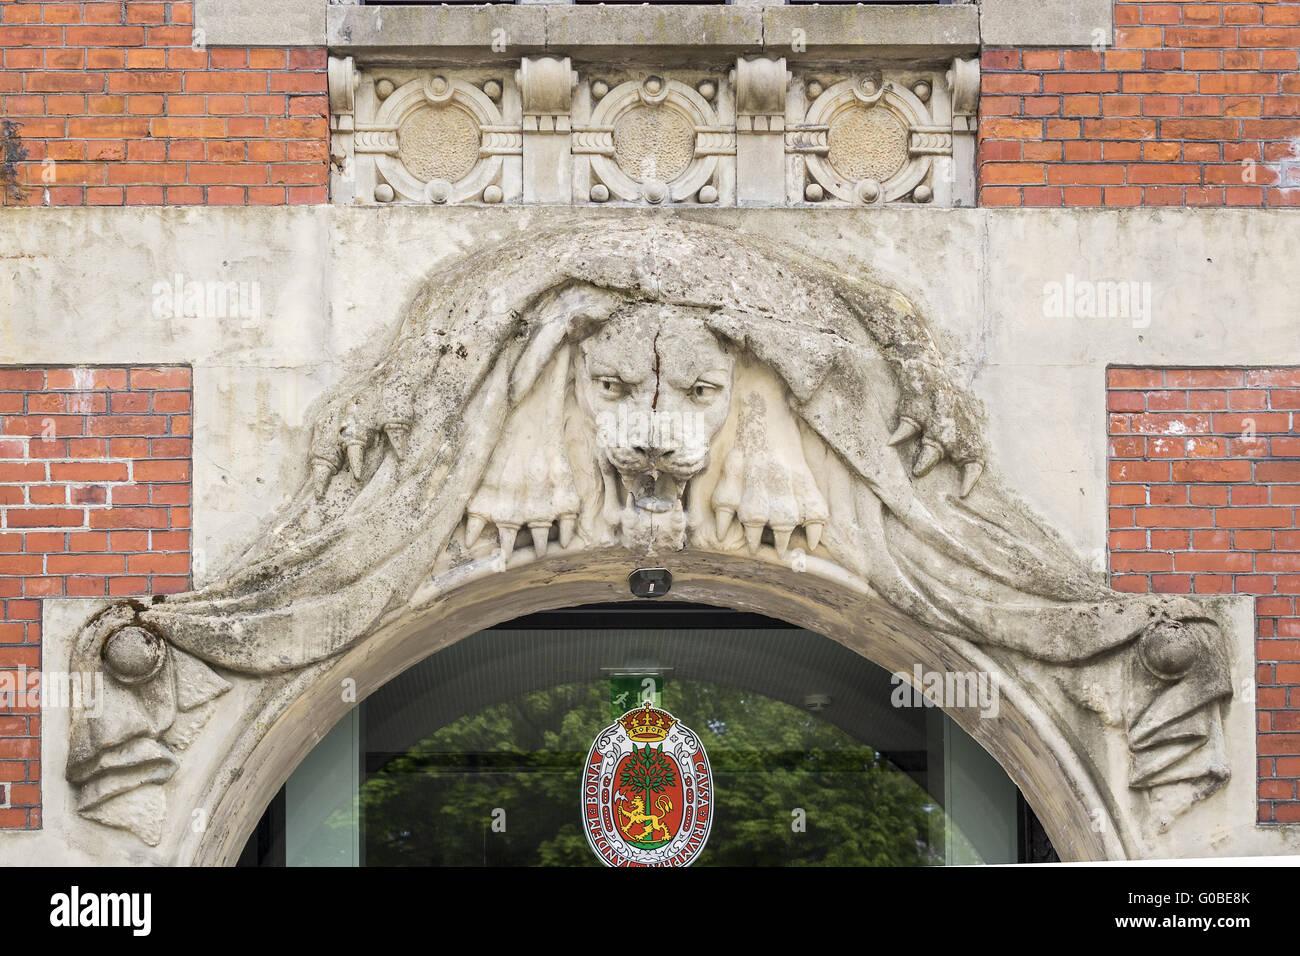 Lion Facade On Tourist Information Building Kristi - Stock Image